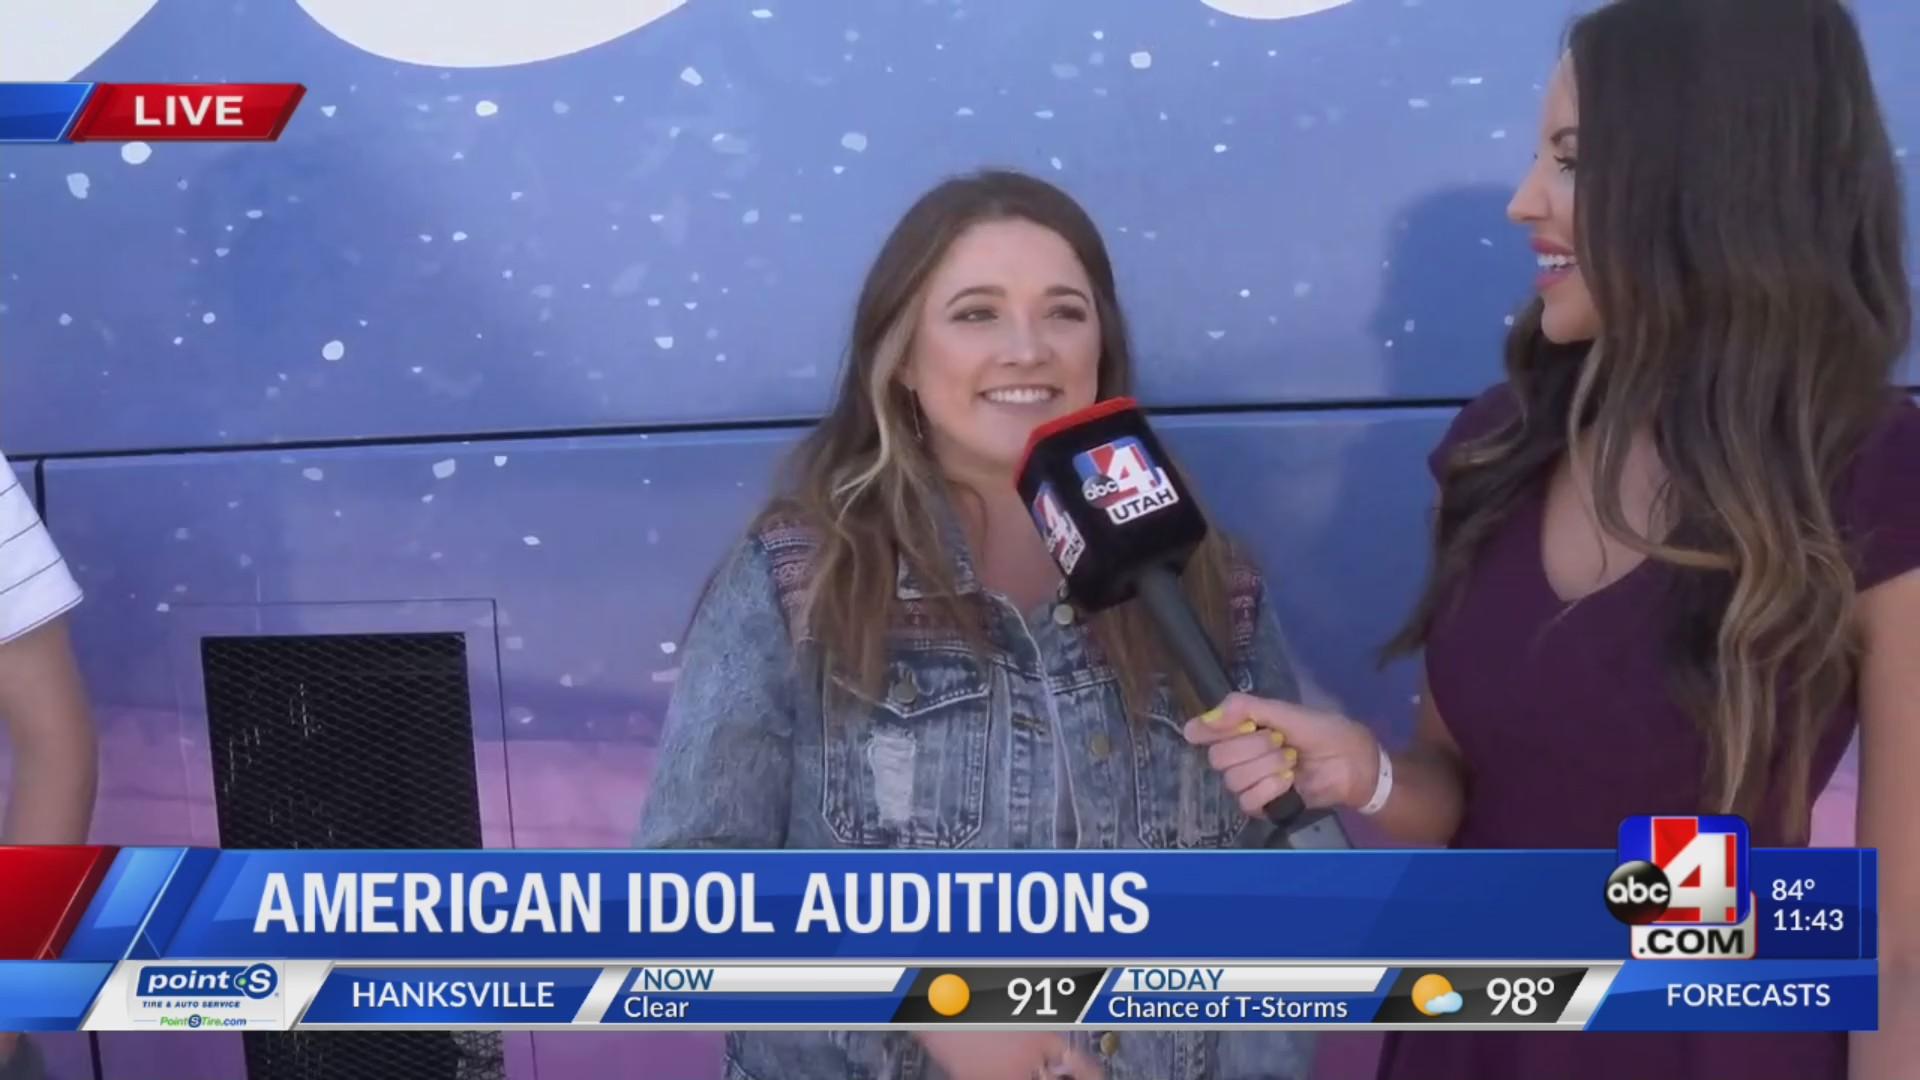 American Idol auditions in Salt Lake City | ABC 4